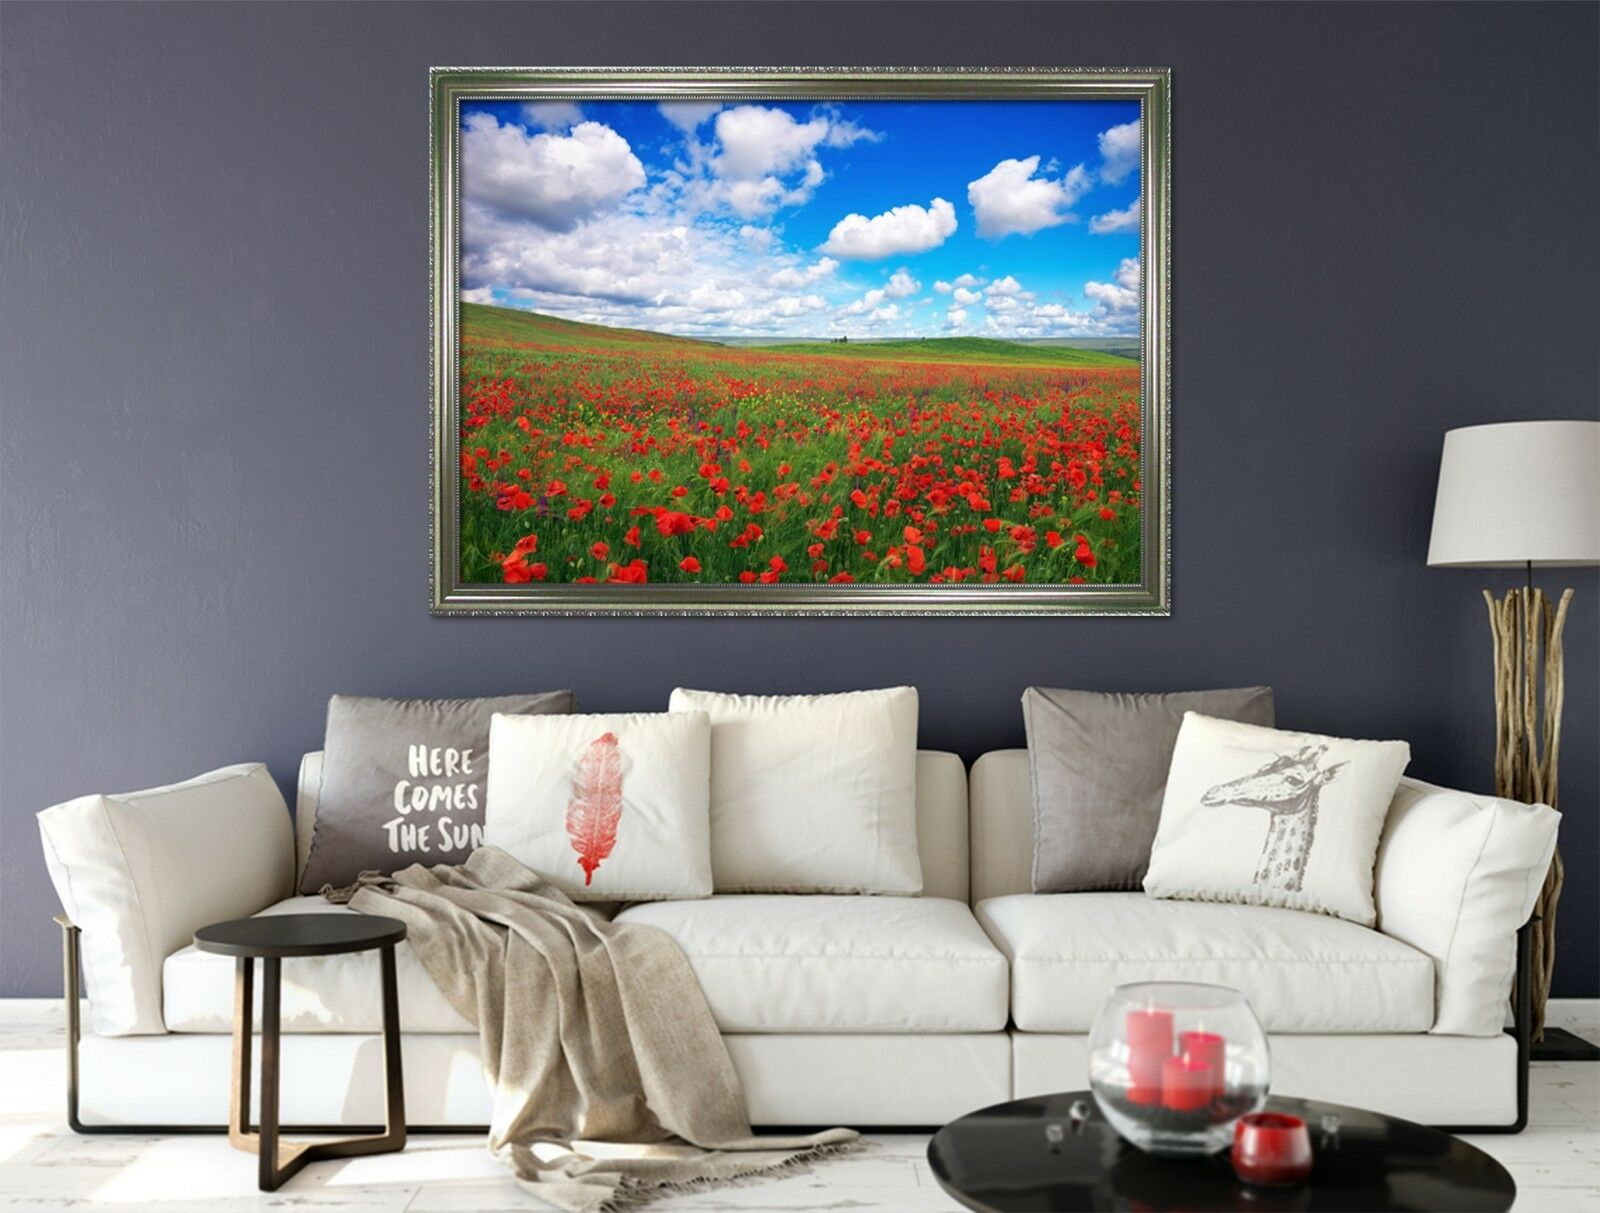 Campo De Flores 3D 67 Póster Enmarcado Decoración del Hogar Pintura de Impresión Arte AJ Wallpaper